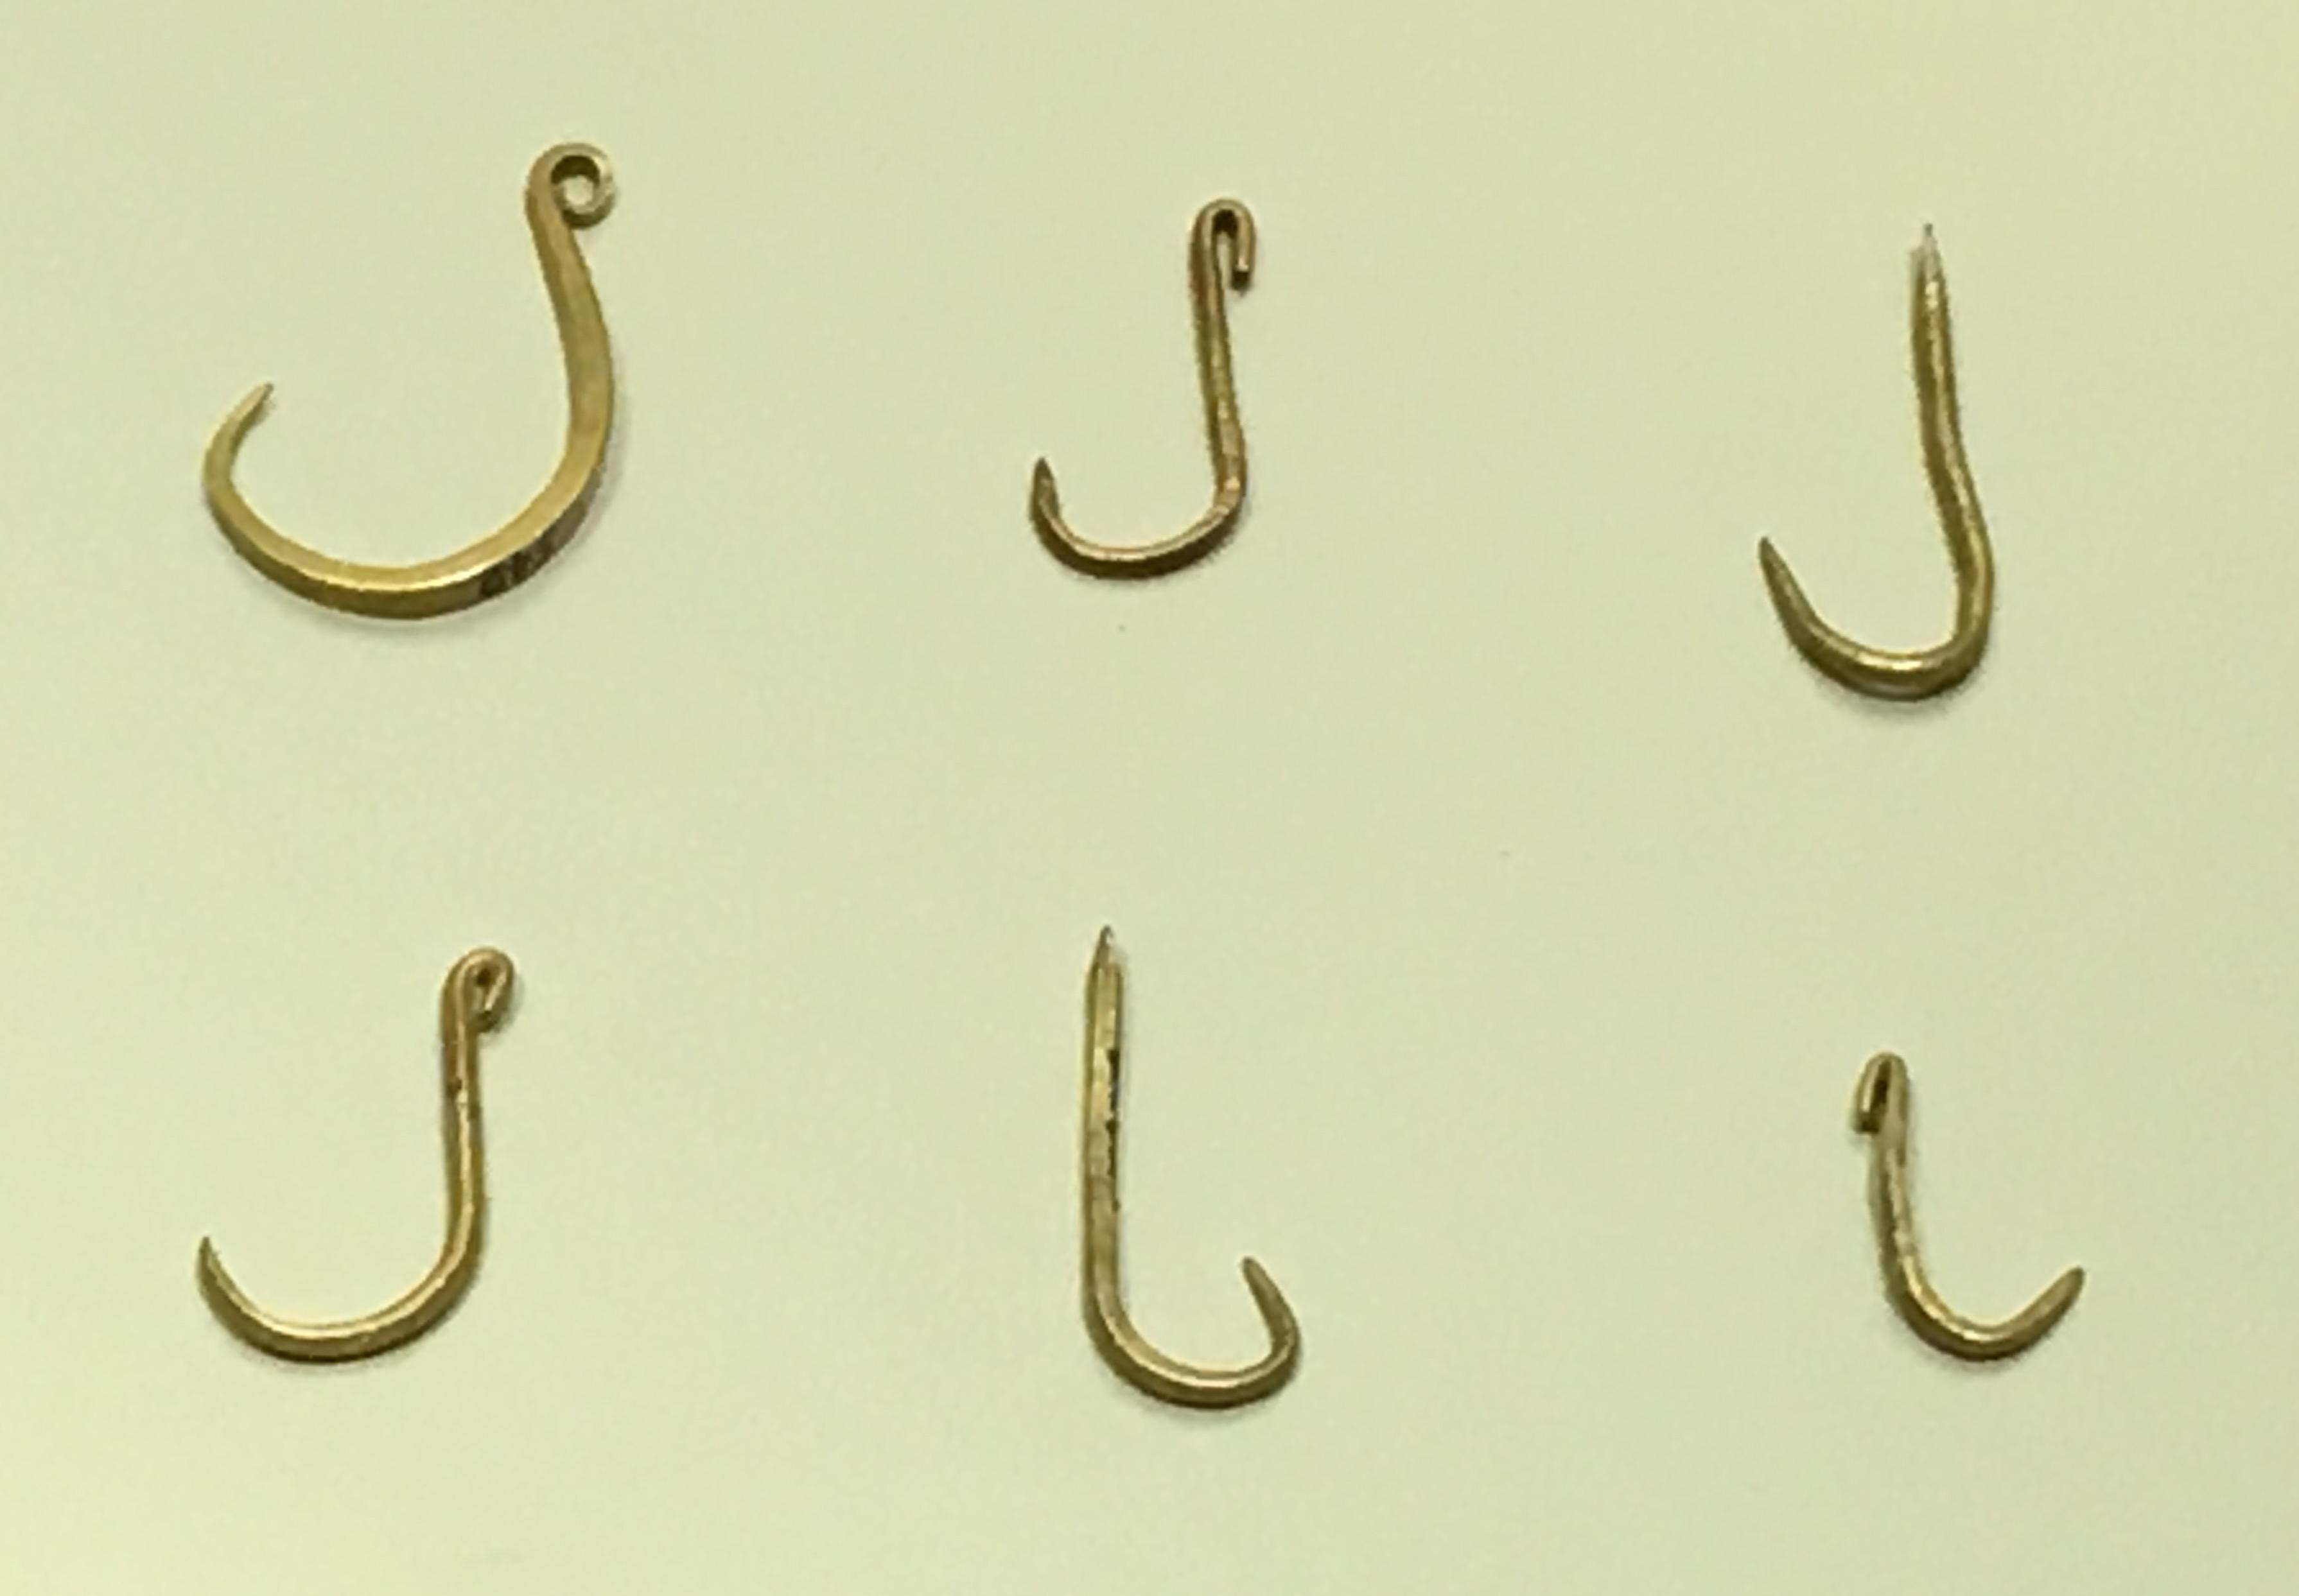 Sea Fishing Hooks Size Chart: Golden Fishing Hooks.jpg - Wikimedia Commons,Chart